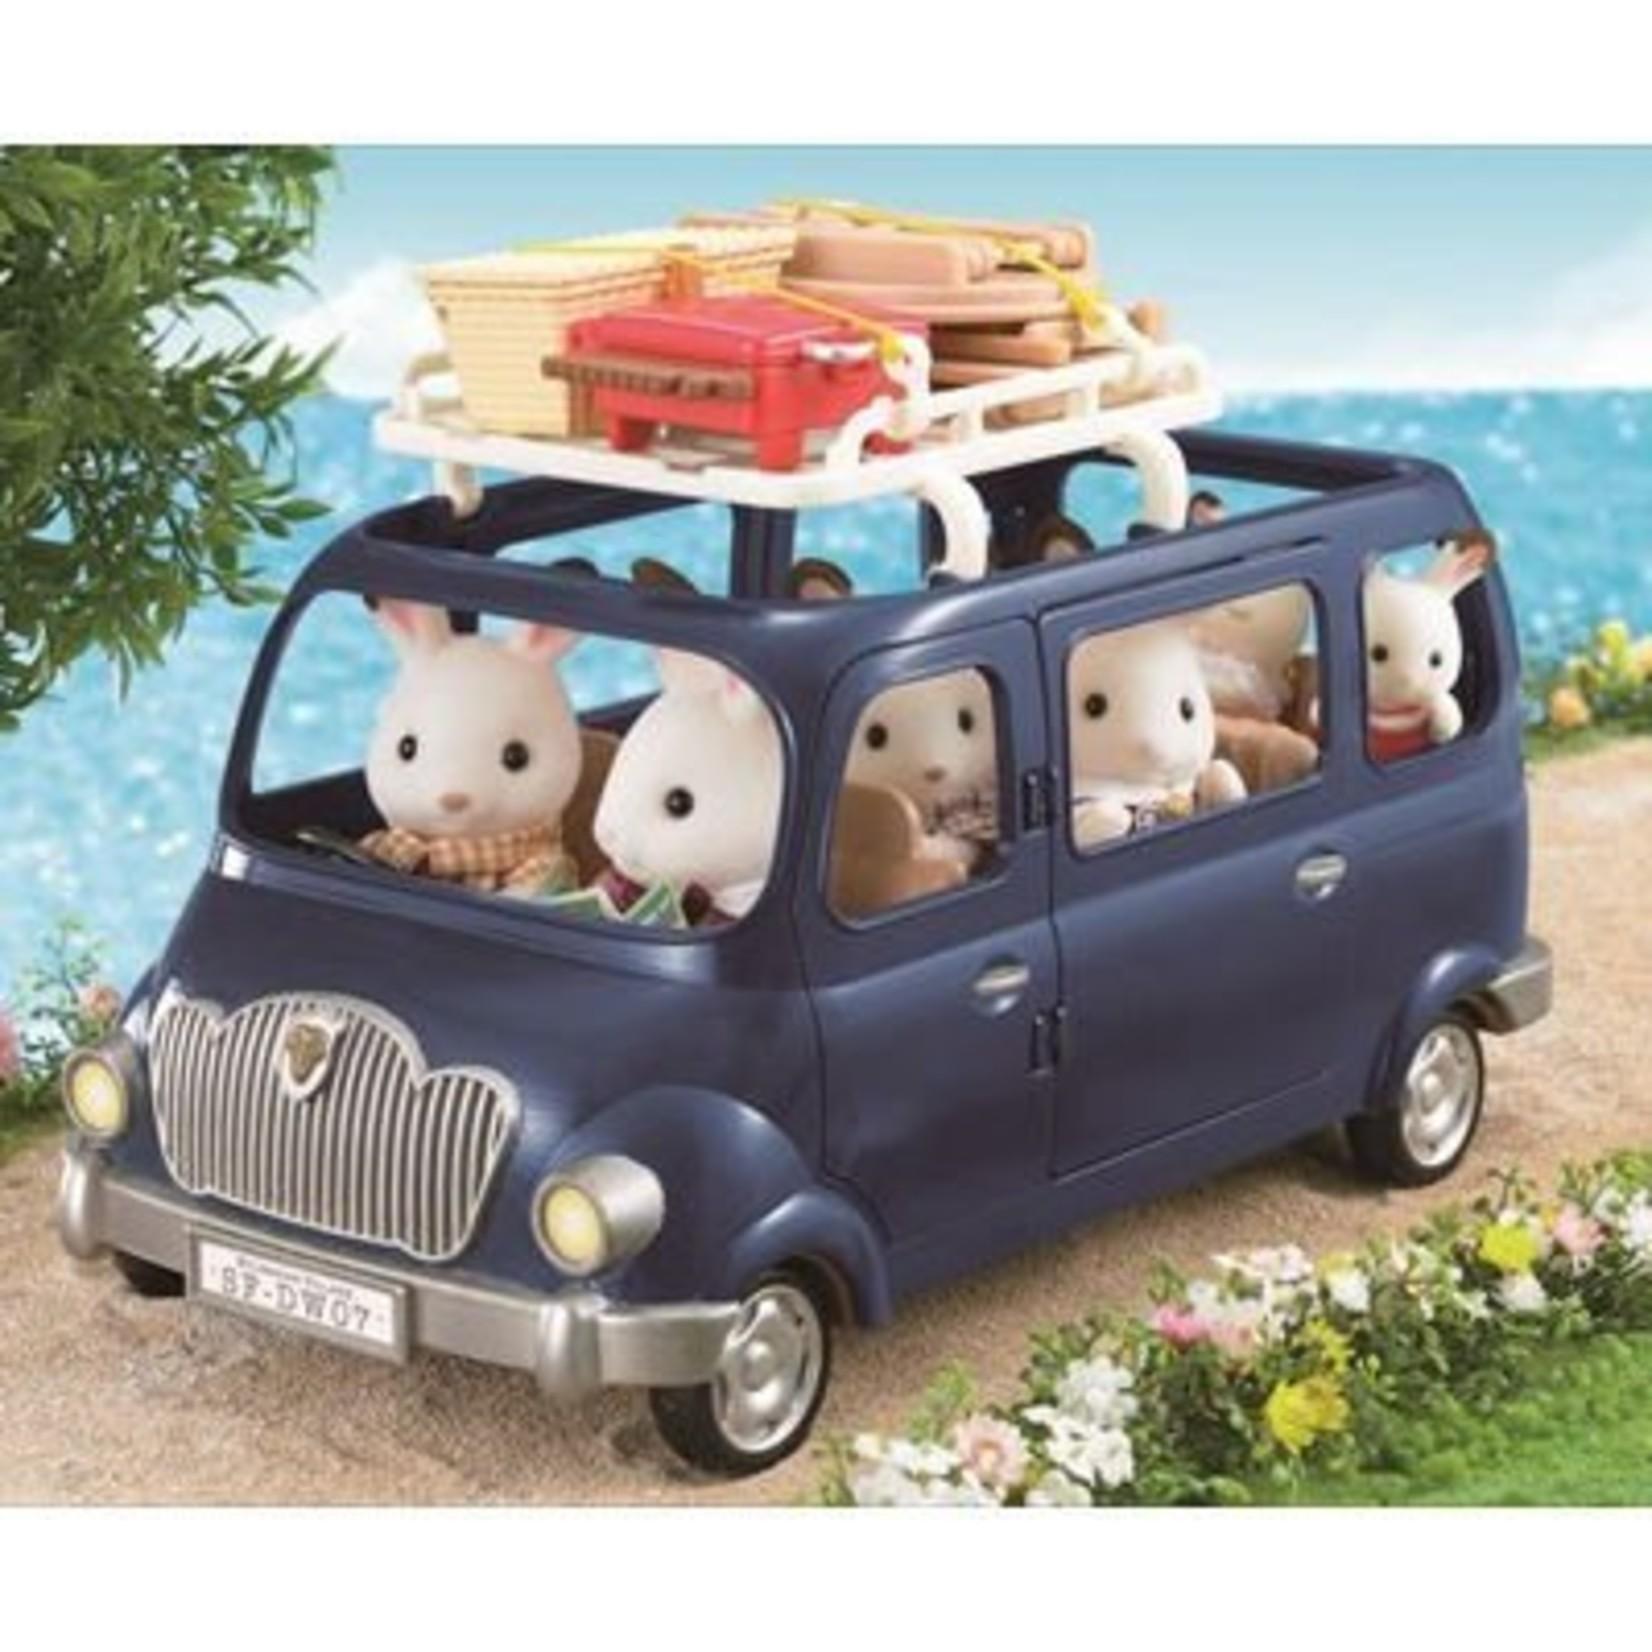 Sylvanian Families 7-zits Familiewagen